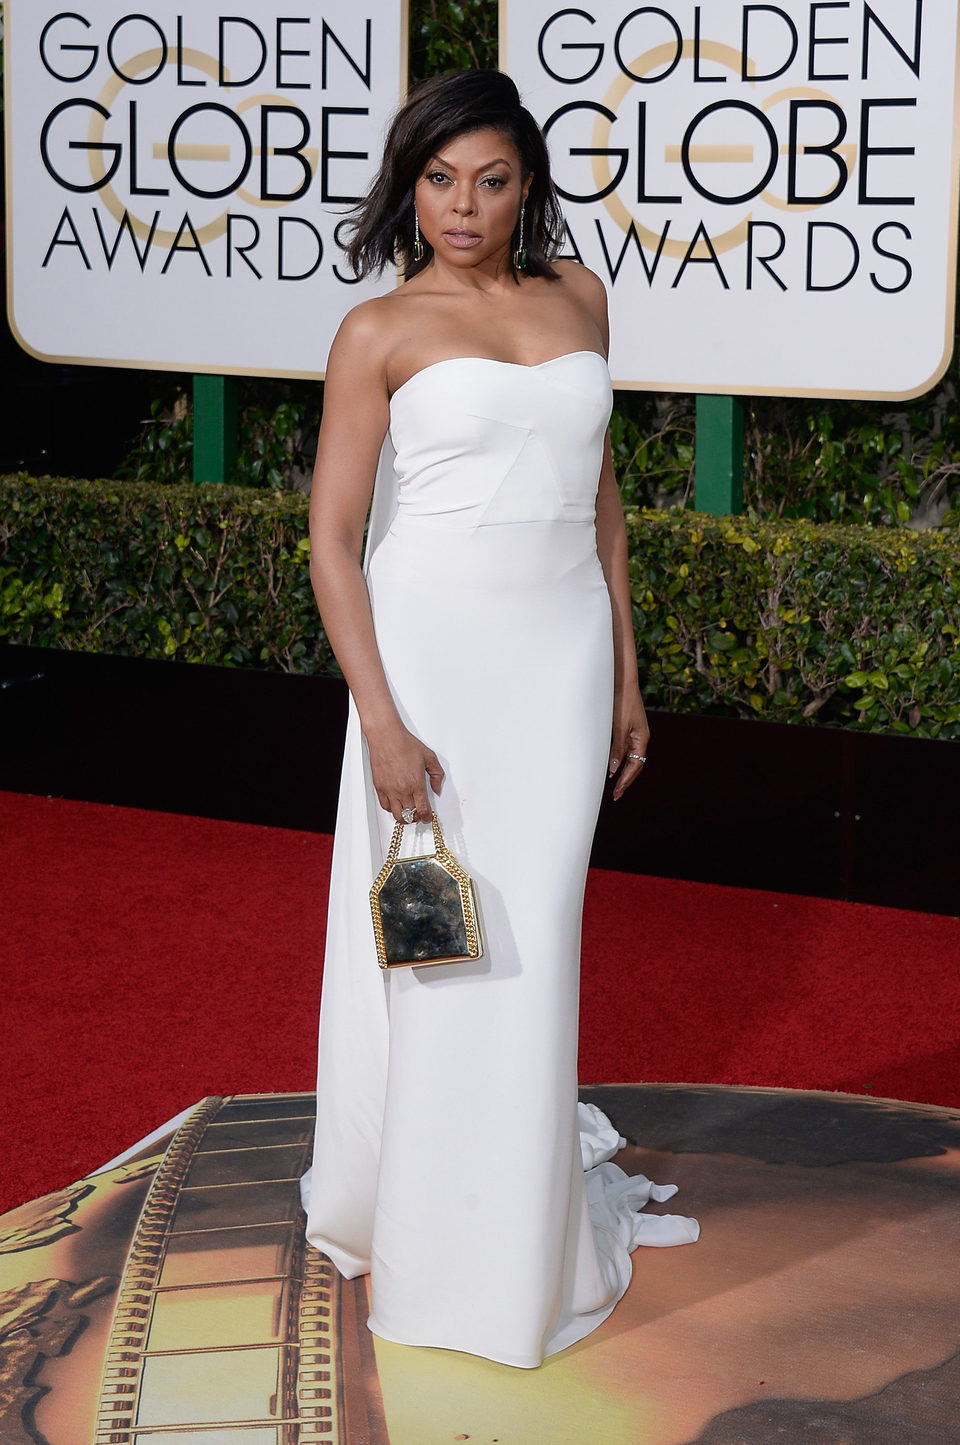 Taraji P. Henson in the 2016 Golden Globes red carpet